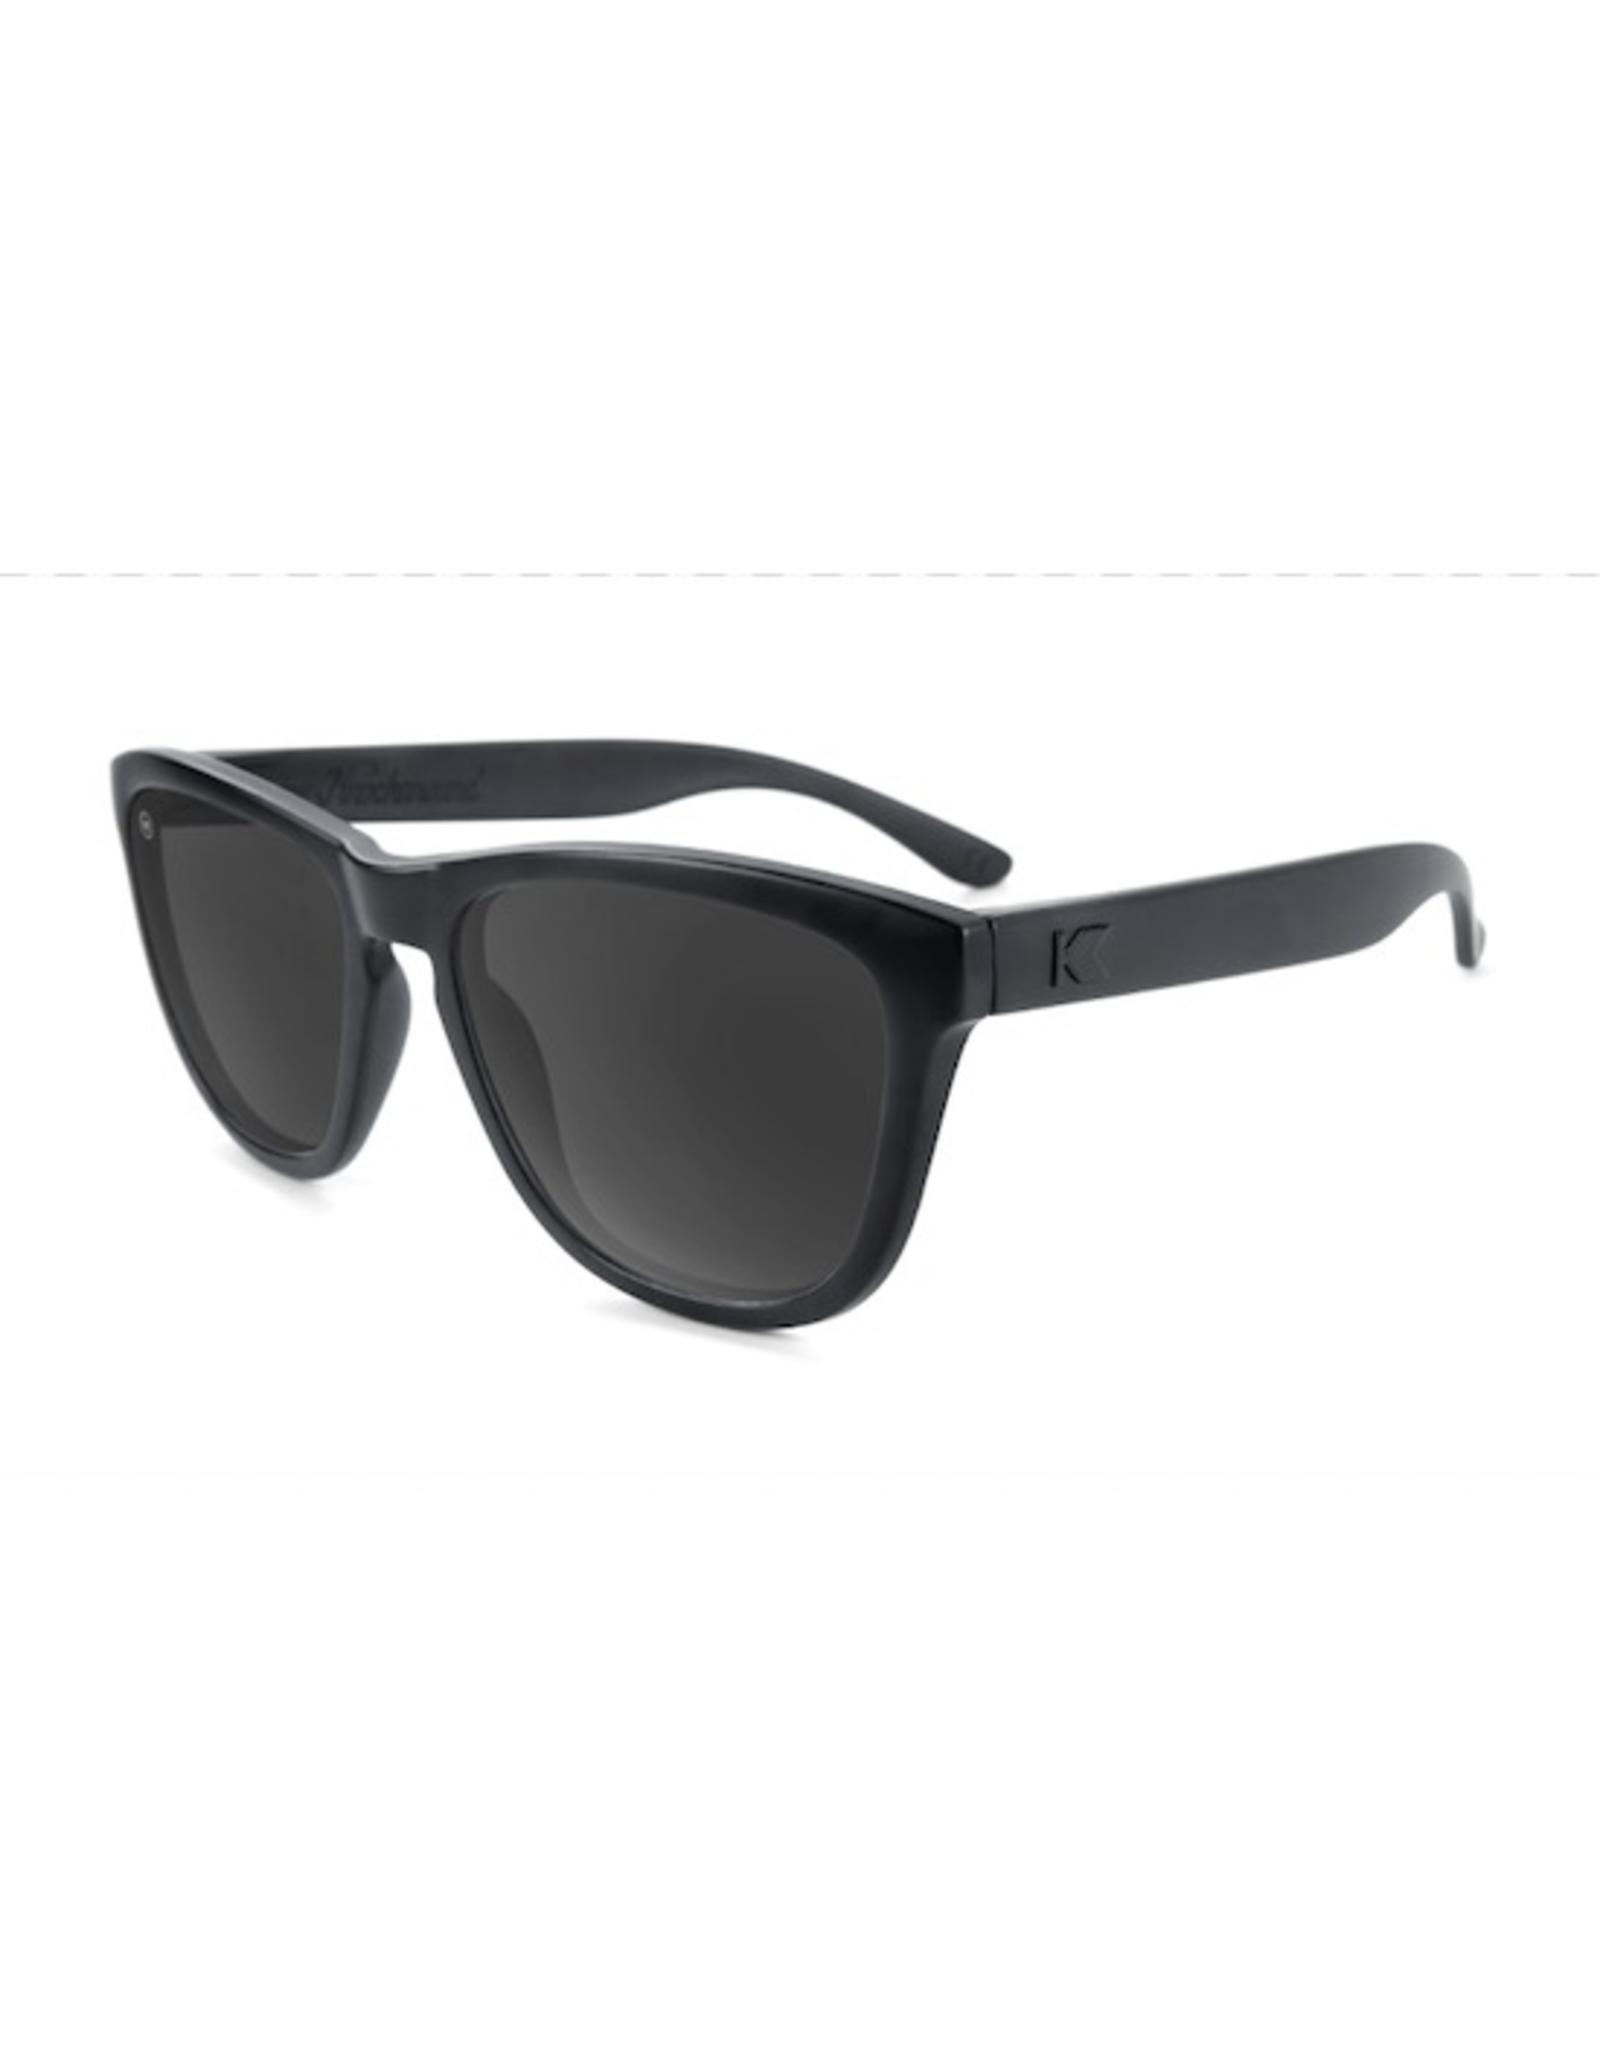 Knockaround Premiums Polarized Black on Black / Smoke